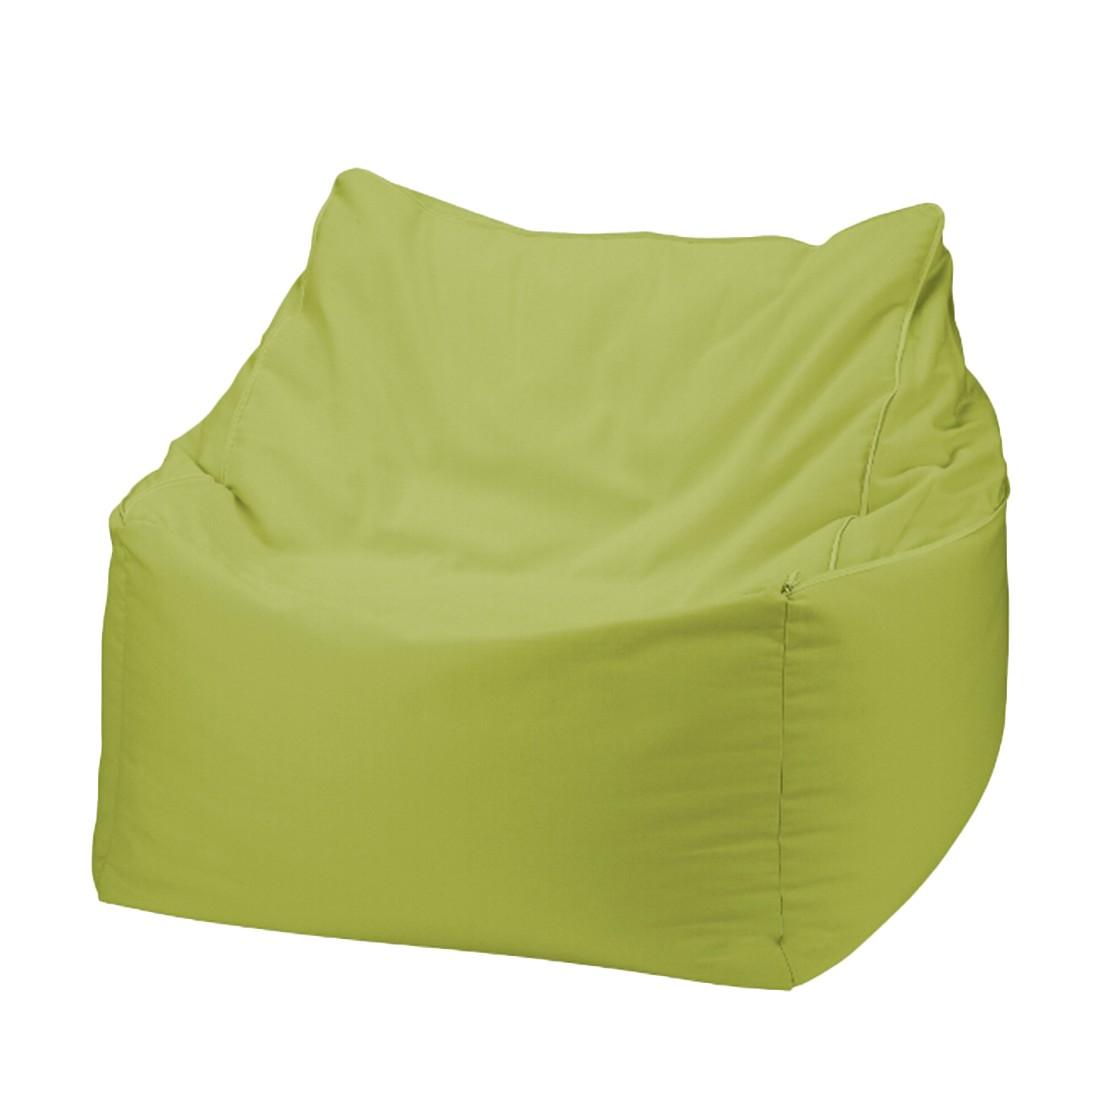 Sitzwürfel 2 in 1Baumwolle impräg. Grün – 50 x 50 cm, KC-Handel günstig kaufen